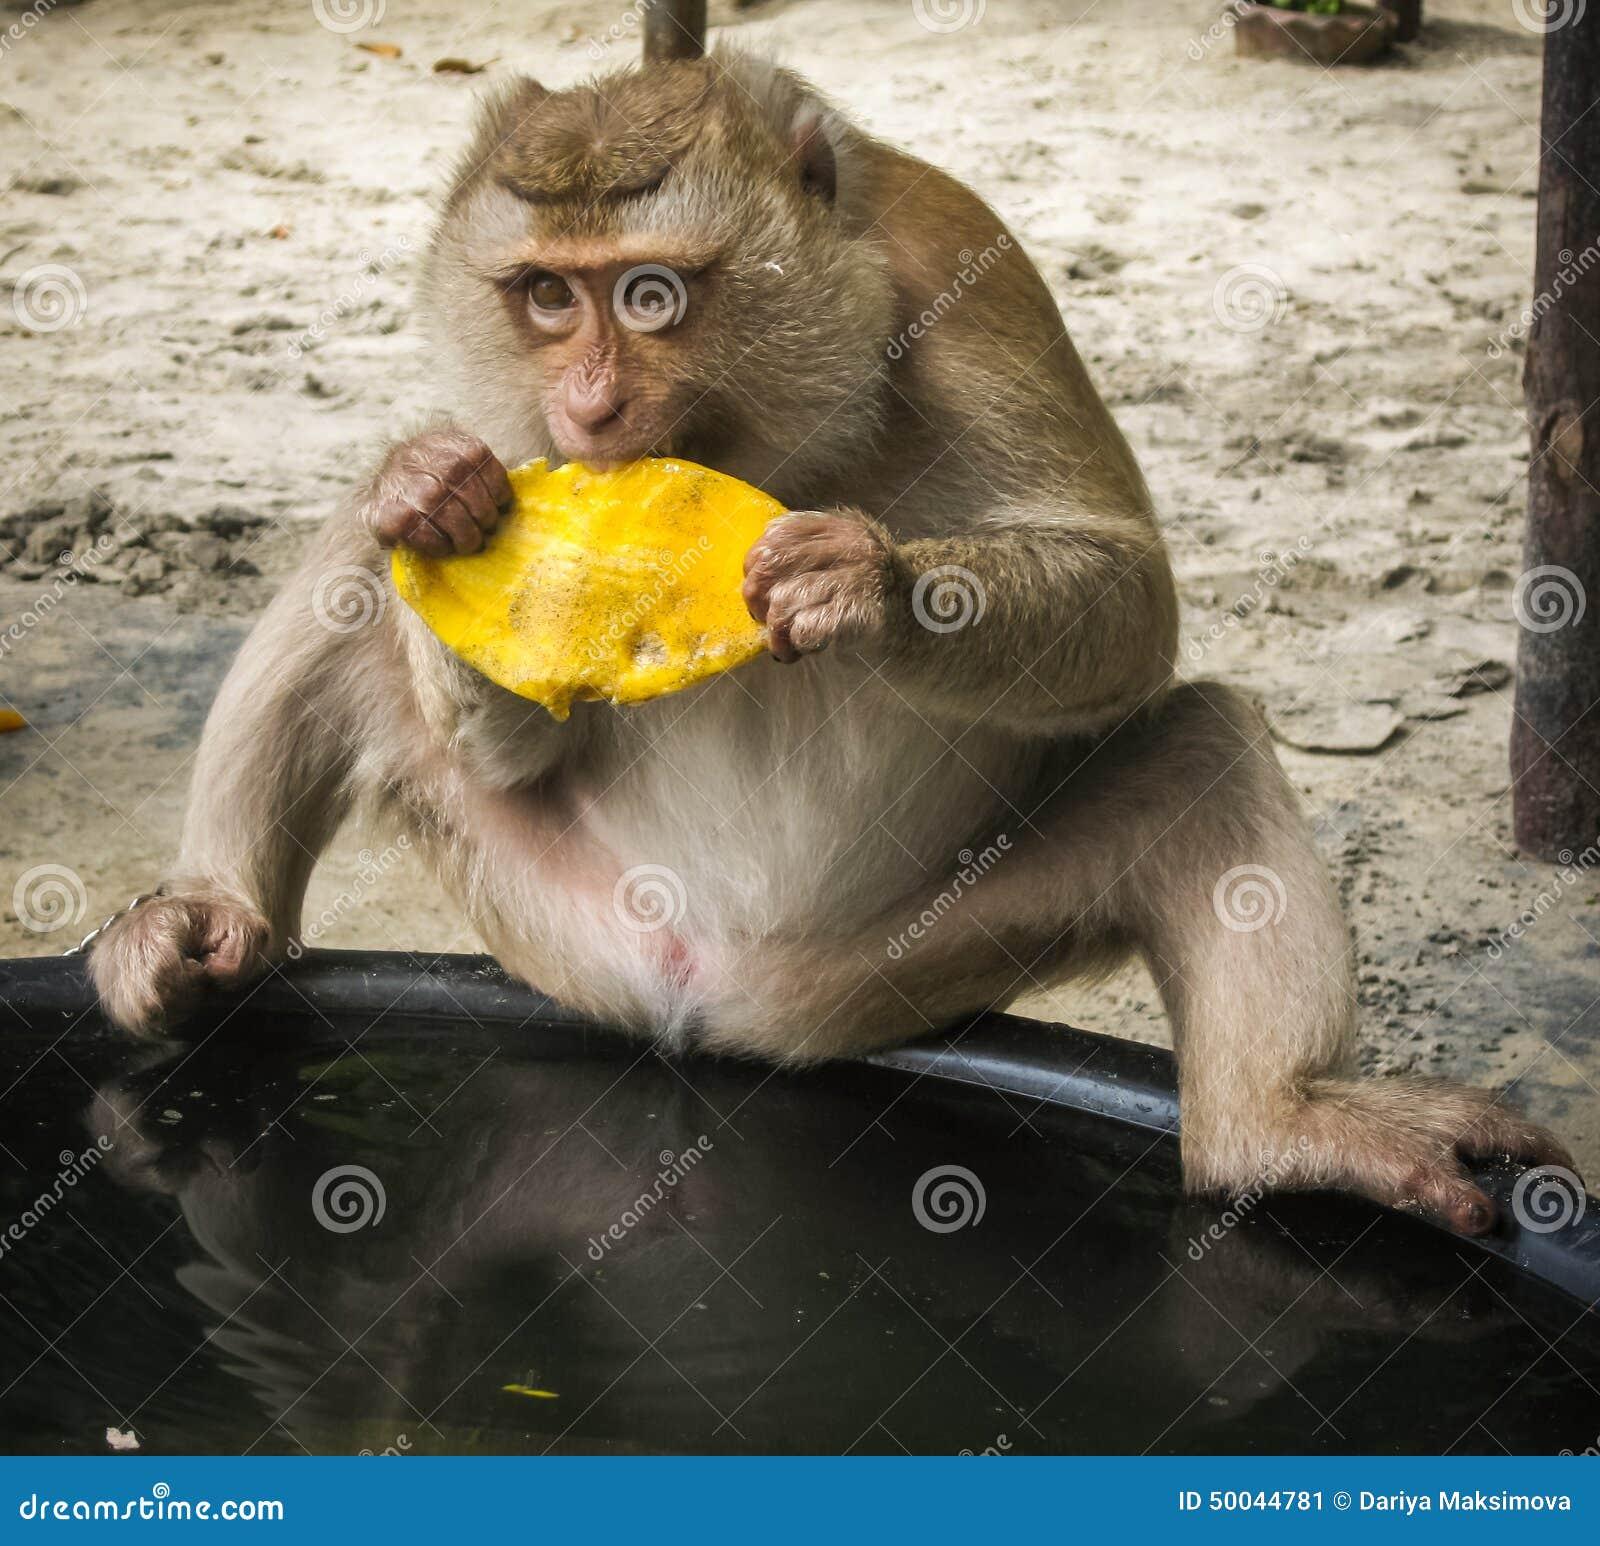 Фото обезьян на пляже 19